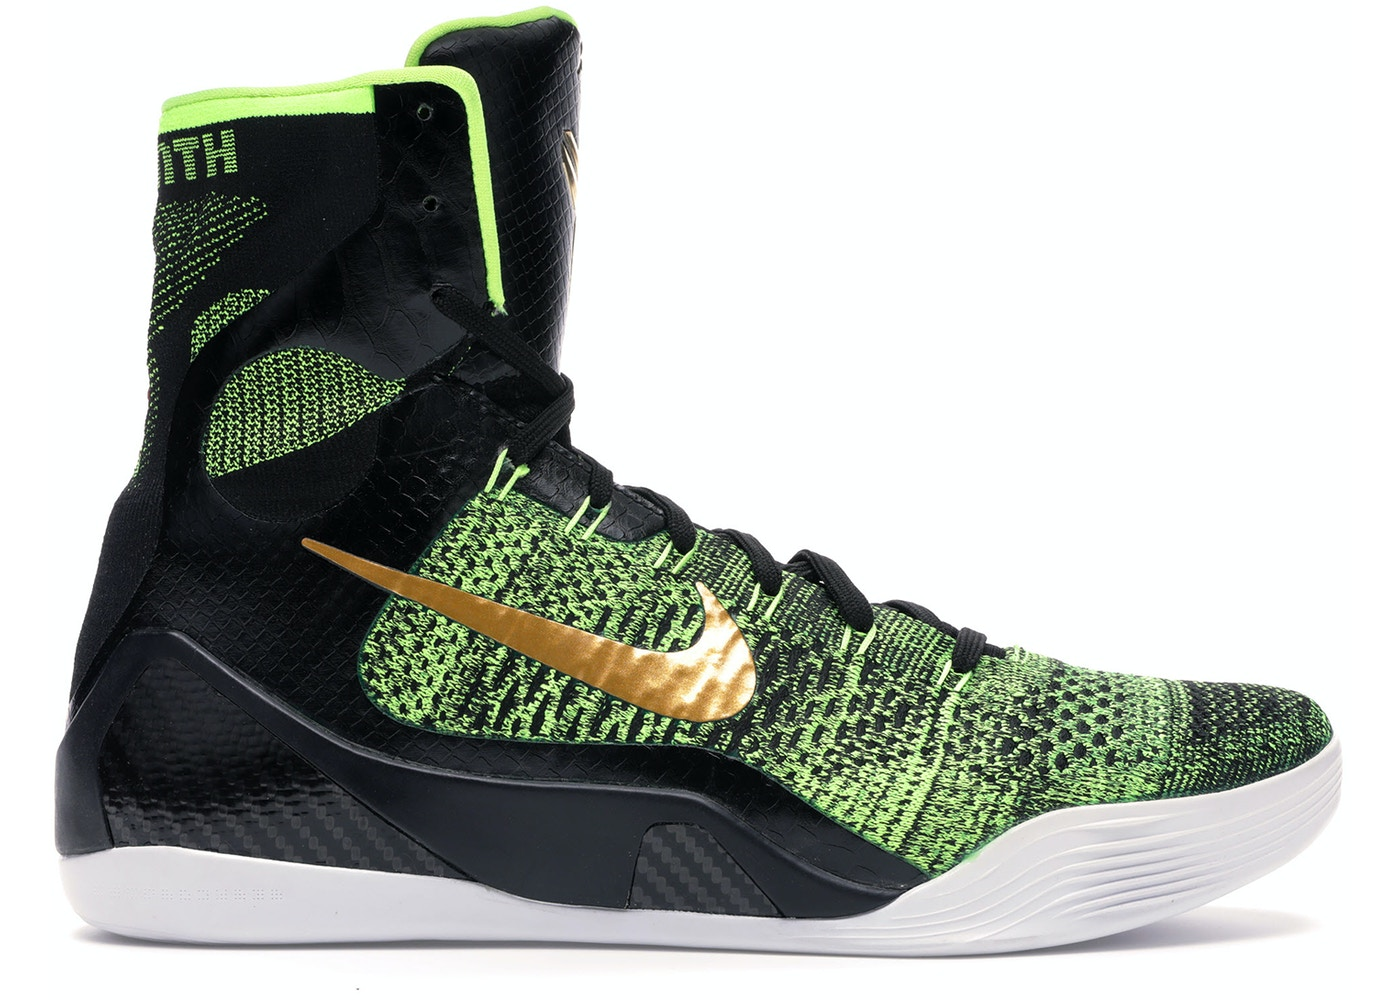 reputable site f00de 75abe Nike Kobe 9 Shoes - Release Date